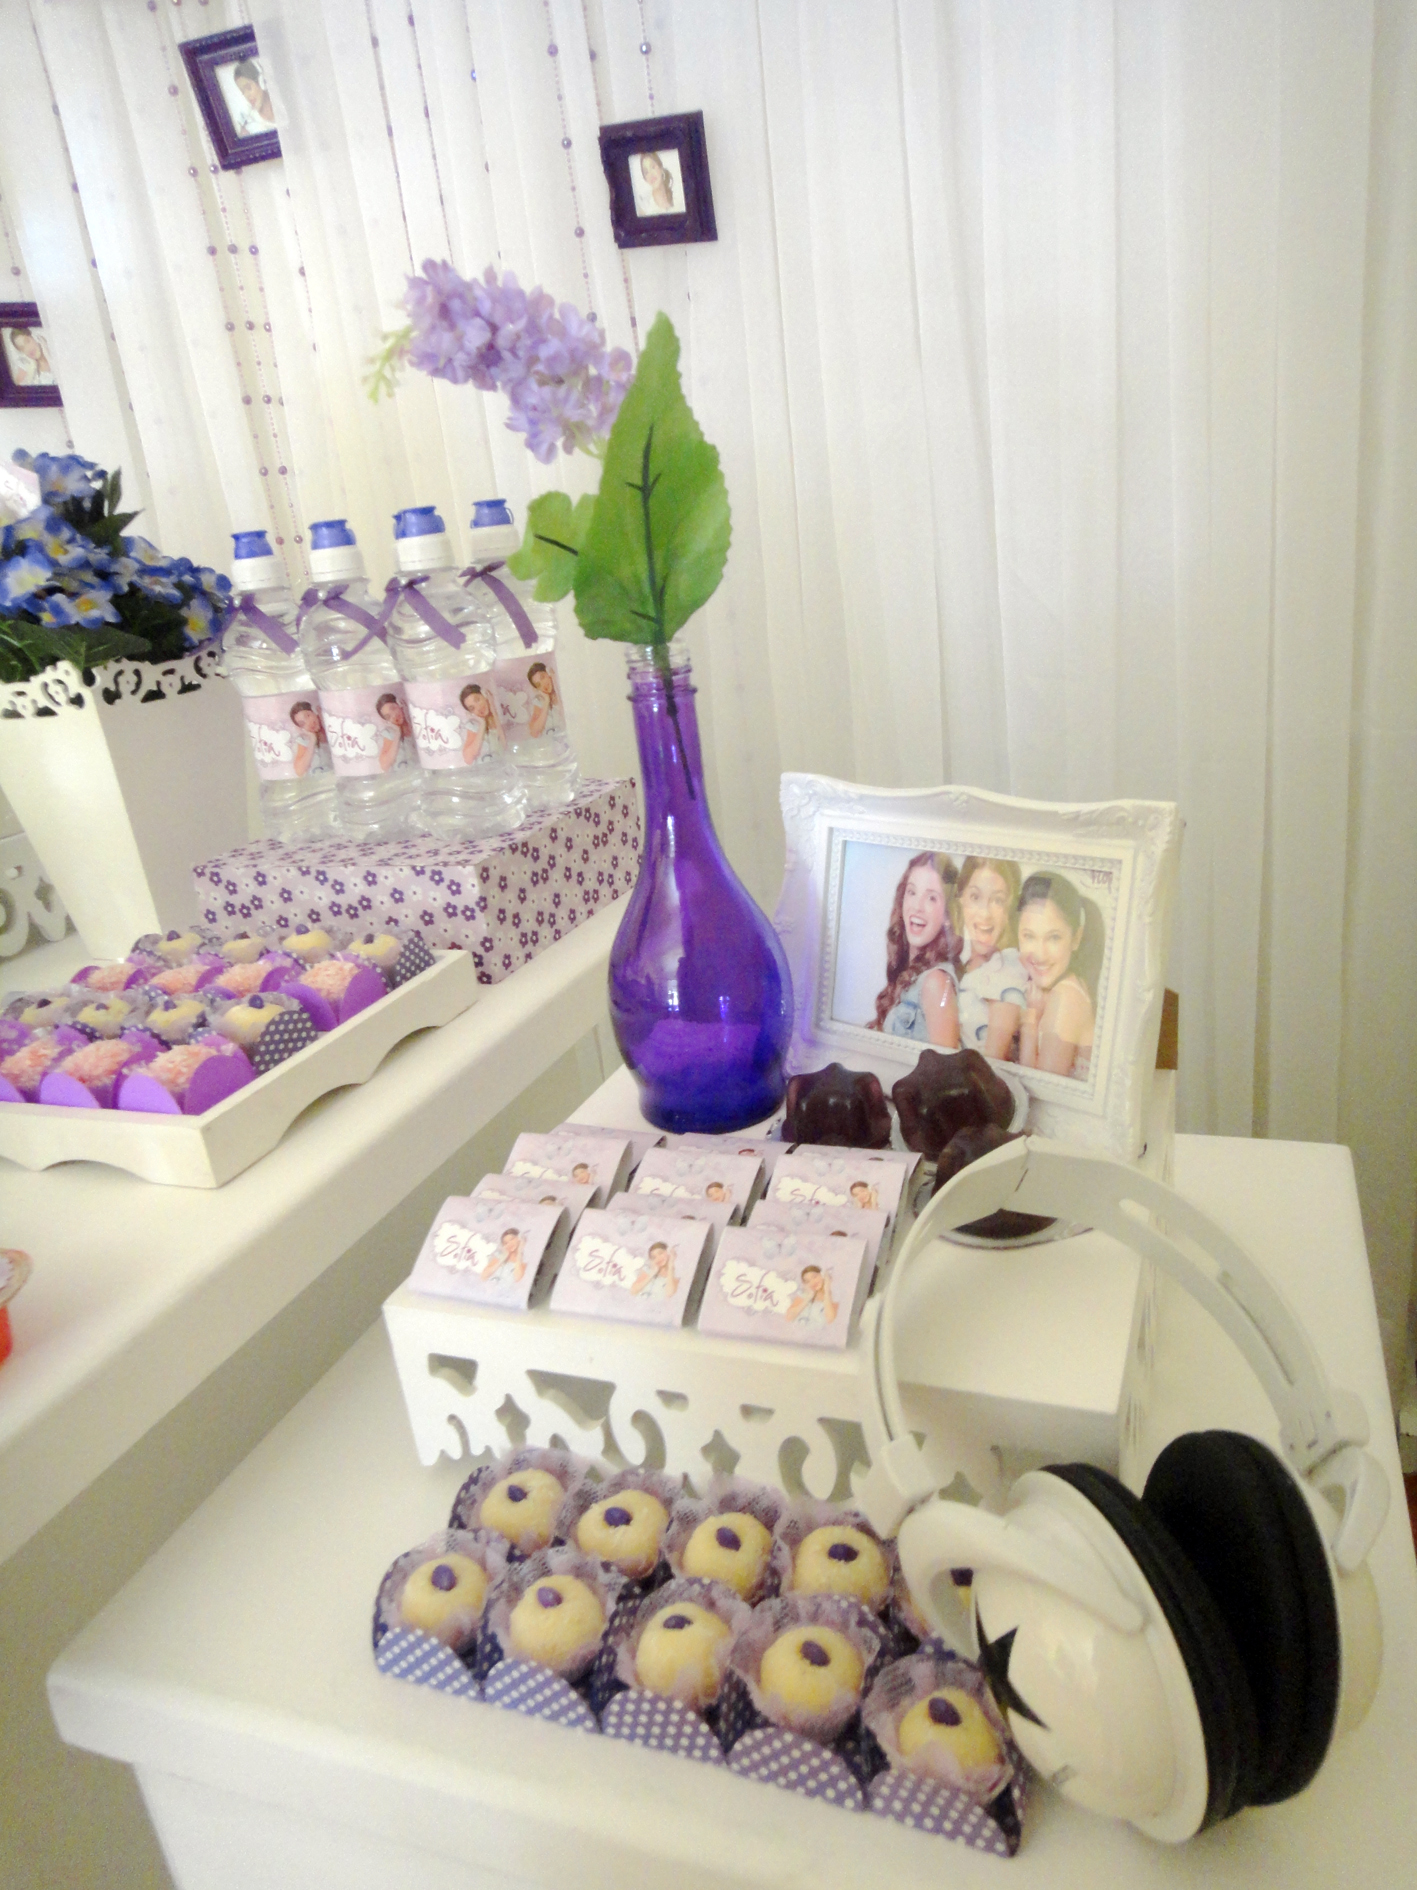 decoracao festa violeta:Sofia Festa Violetta Festa Violetta Da Sofia Decoracao Violetta Disney